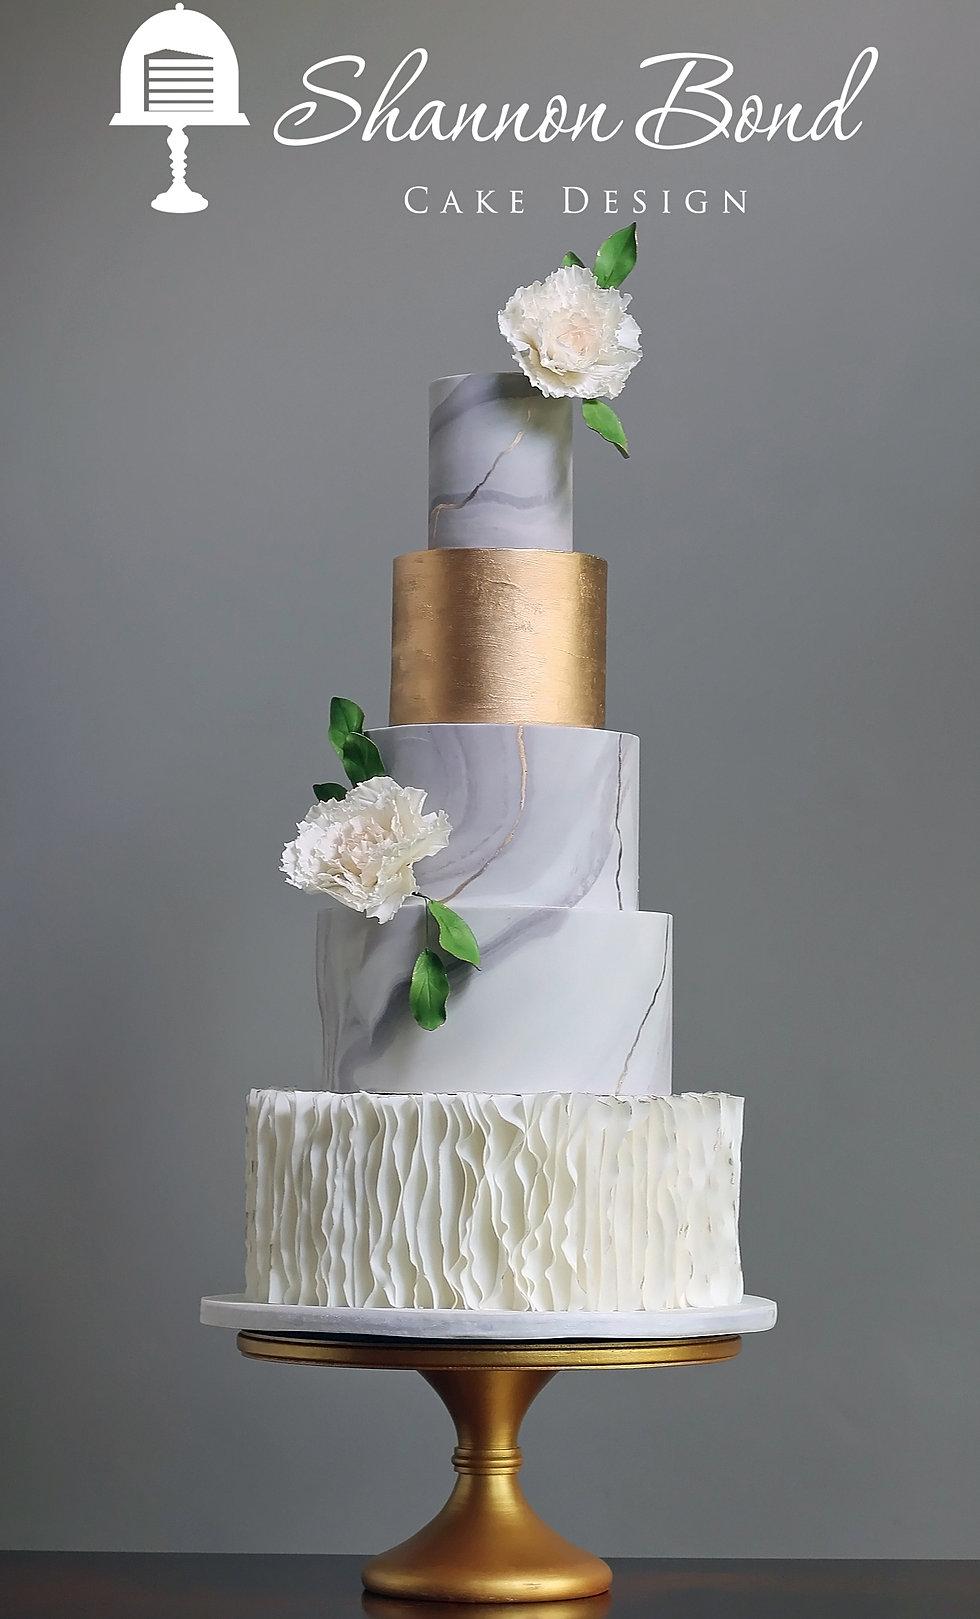 Shannon Bond Cake Design Kansas City Wedding And Custom Cakes - Gold Wedding Cakes